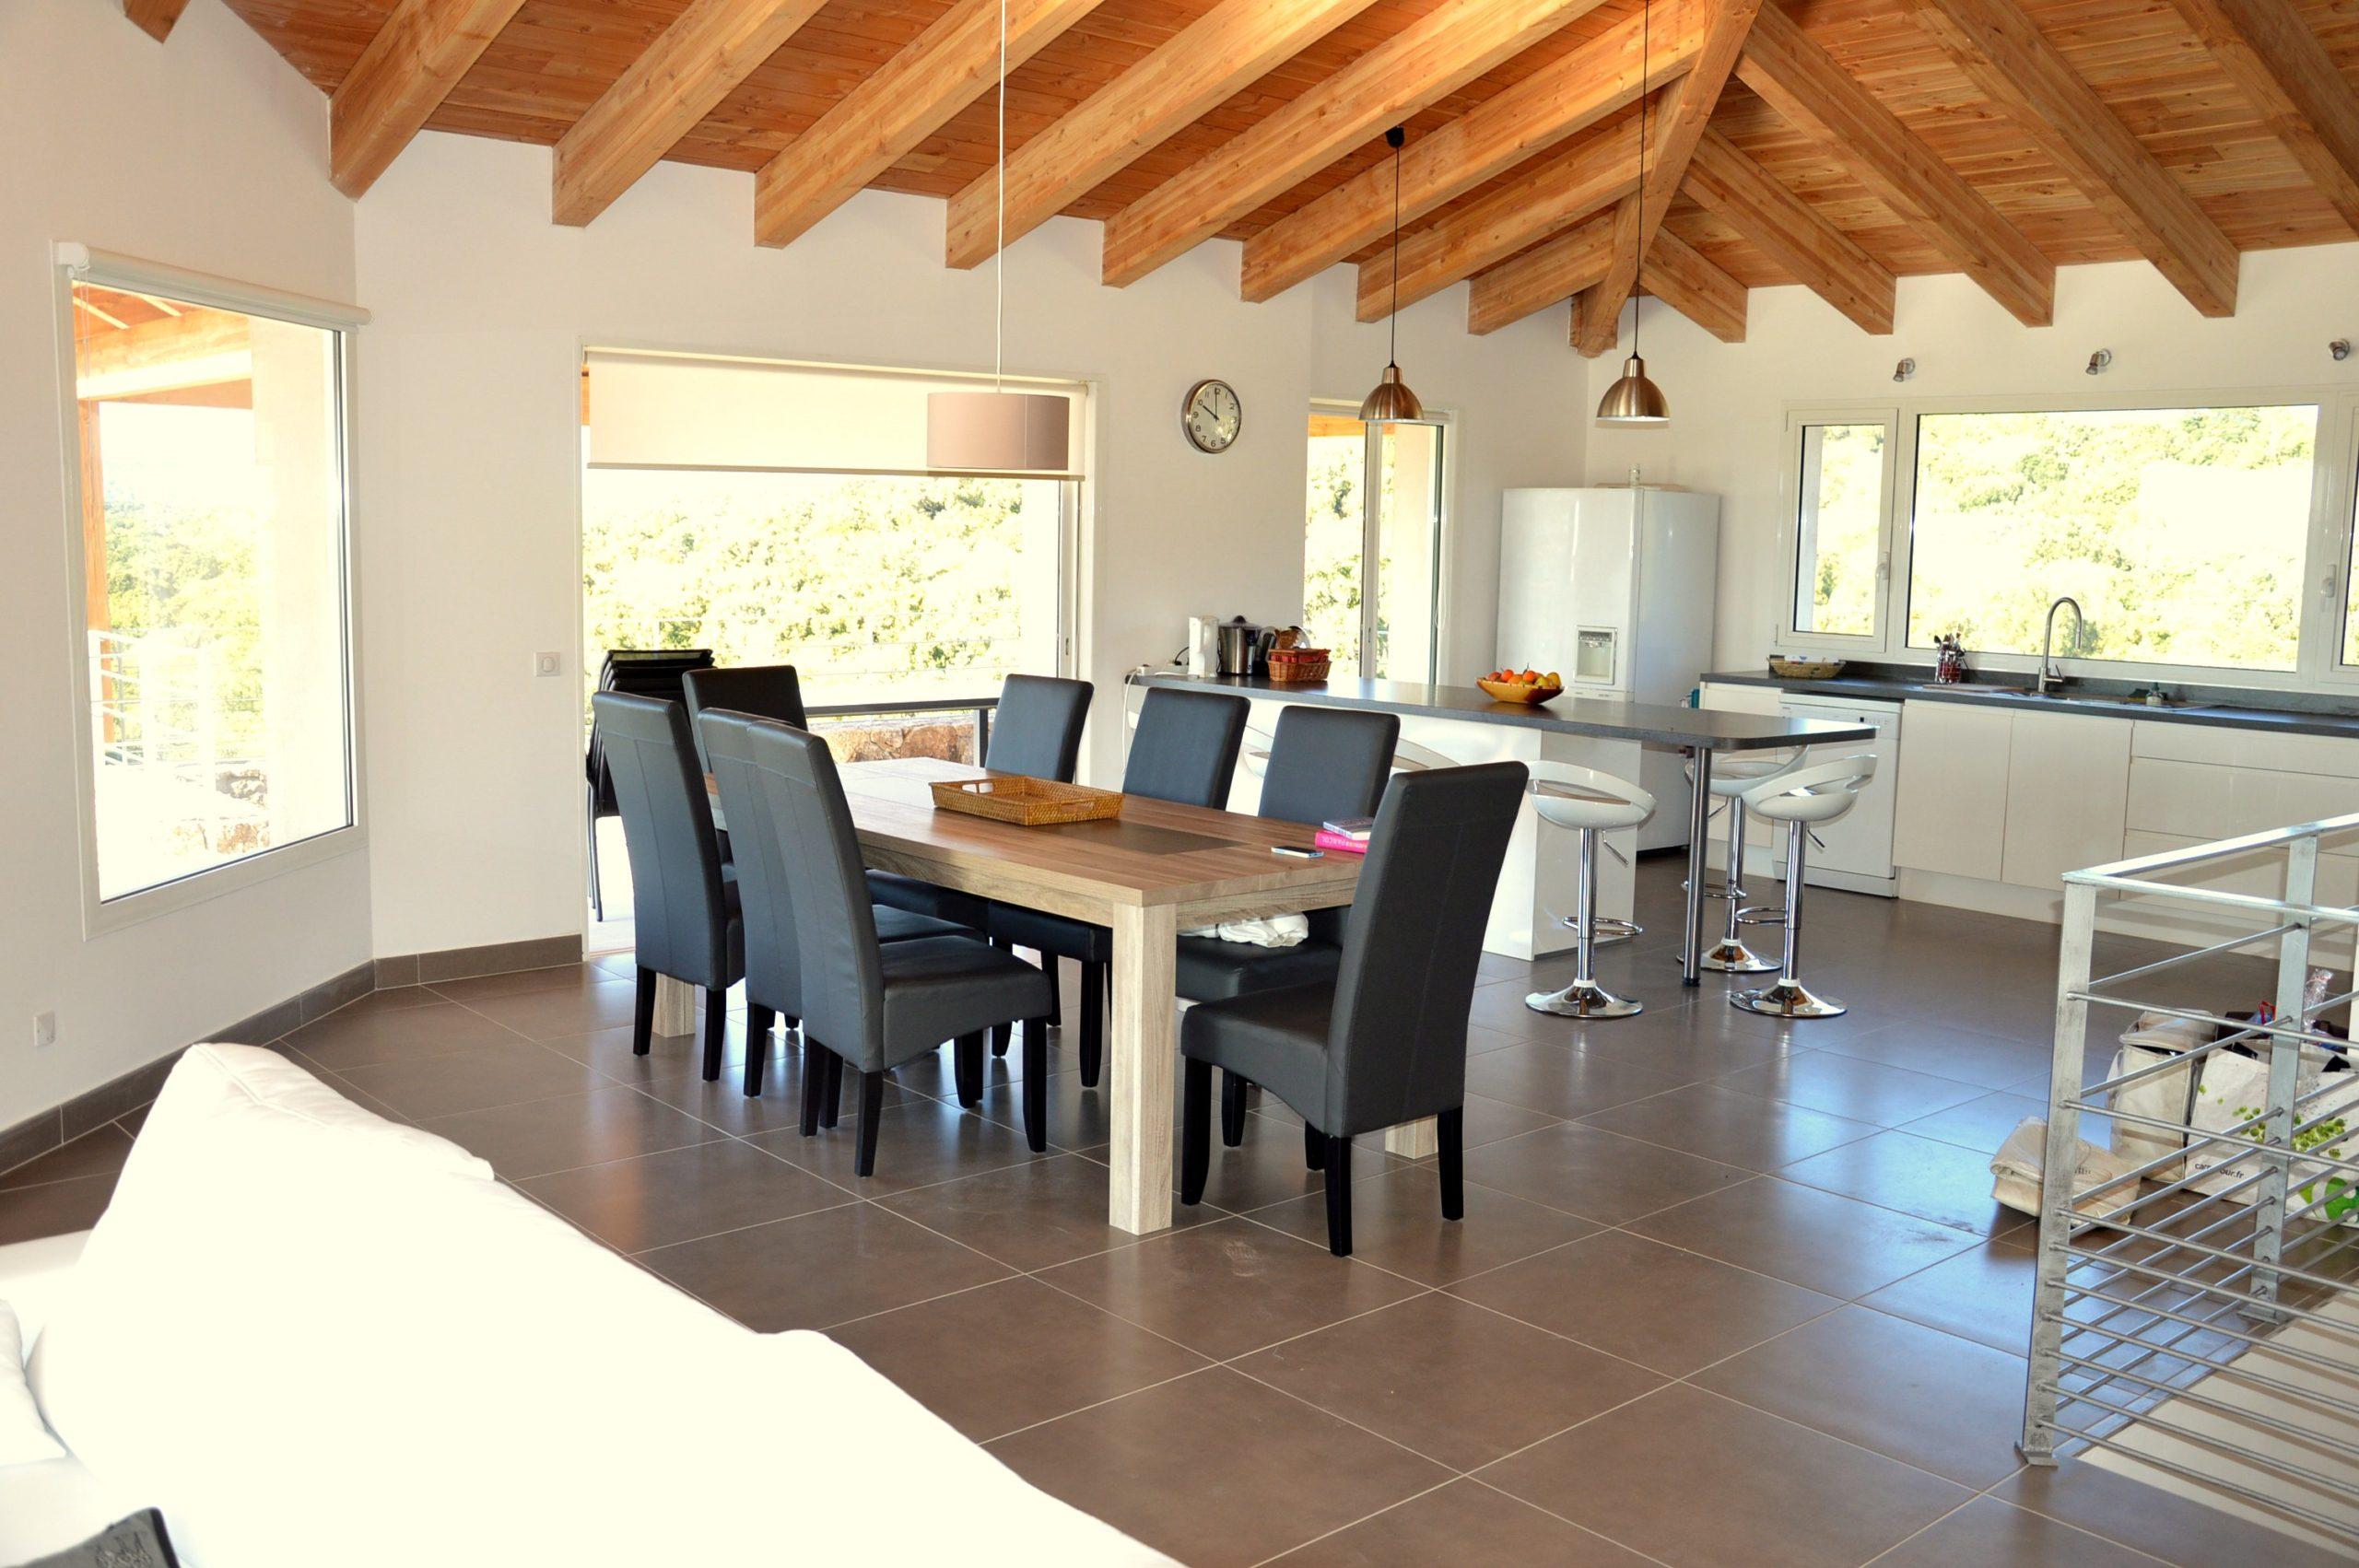 Location villa luxe Porto-Vecchio en Corse du sud 5 chambres piscine proche plage St Cyprien et Cala Rossa climatisation